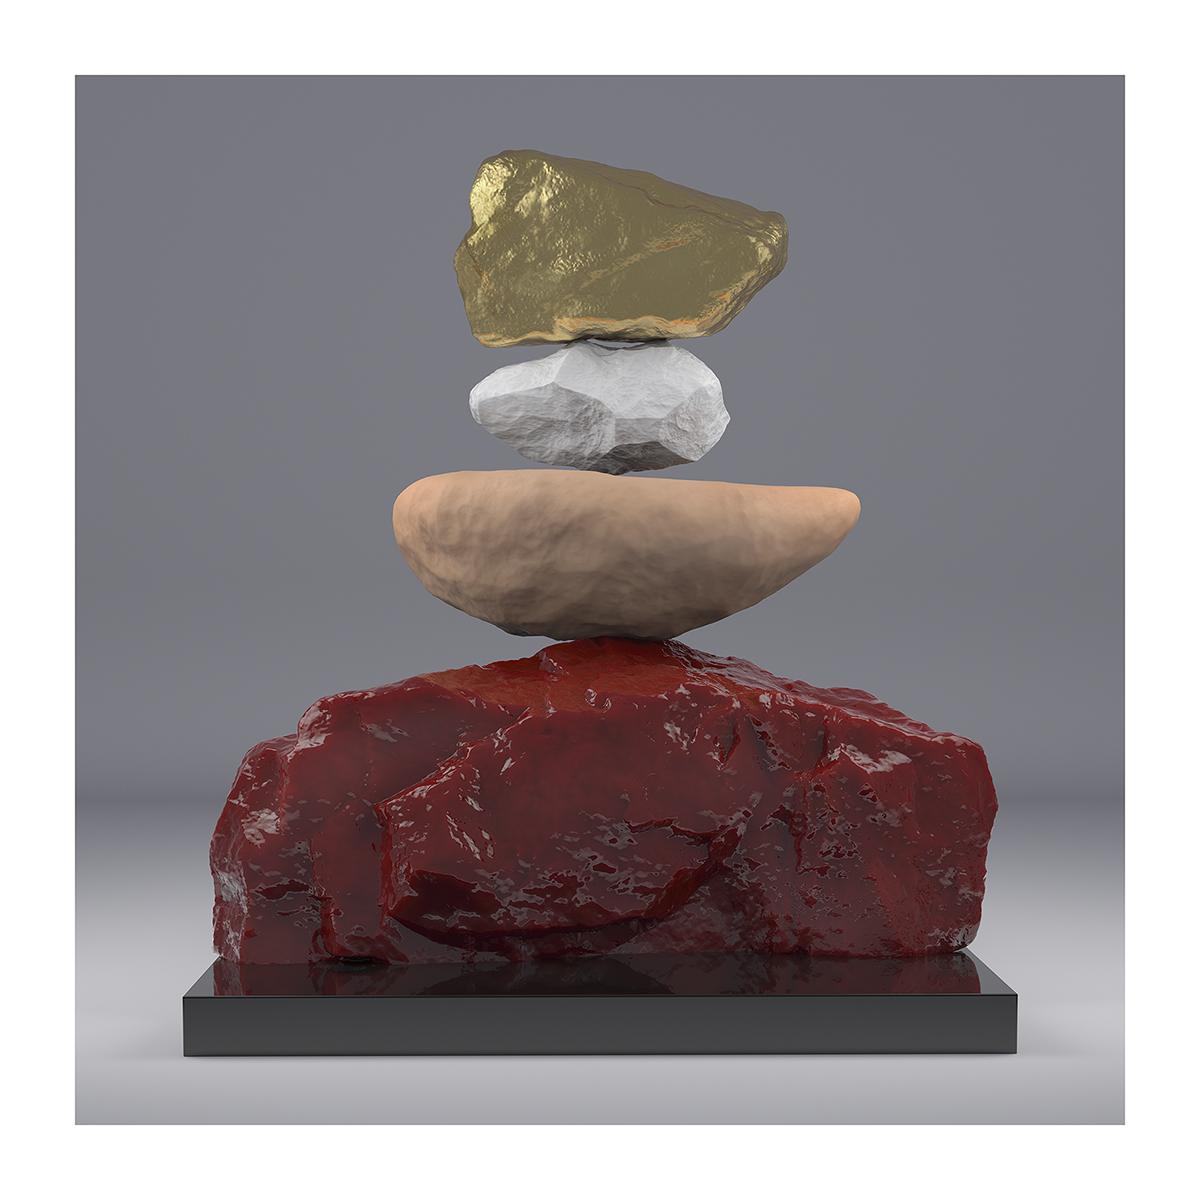 I will not Make any more Boring Art VII 002 1 - 2020 - I will not Make any more Boring Art. VII. (Rock Balancing)